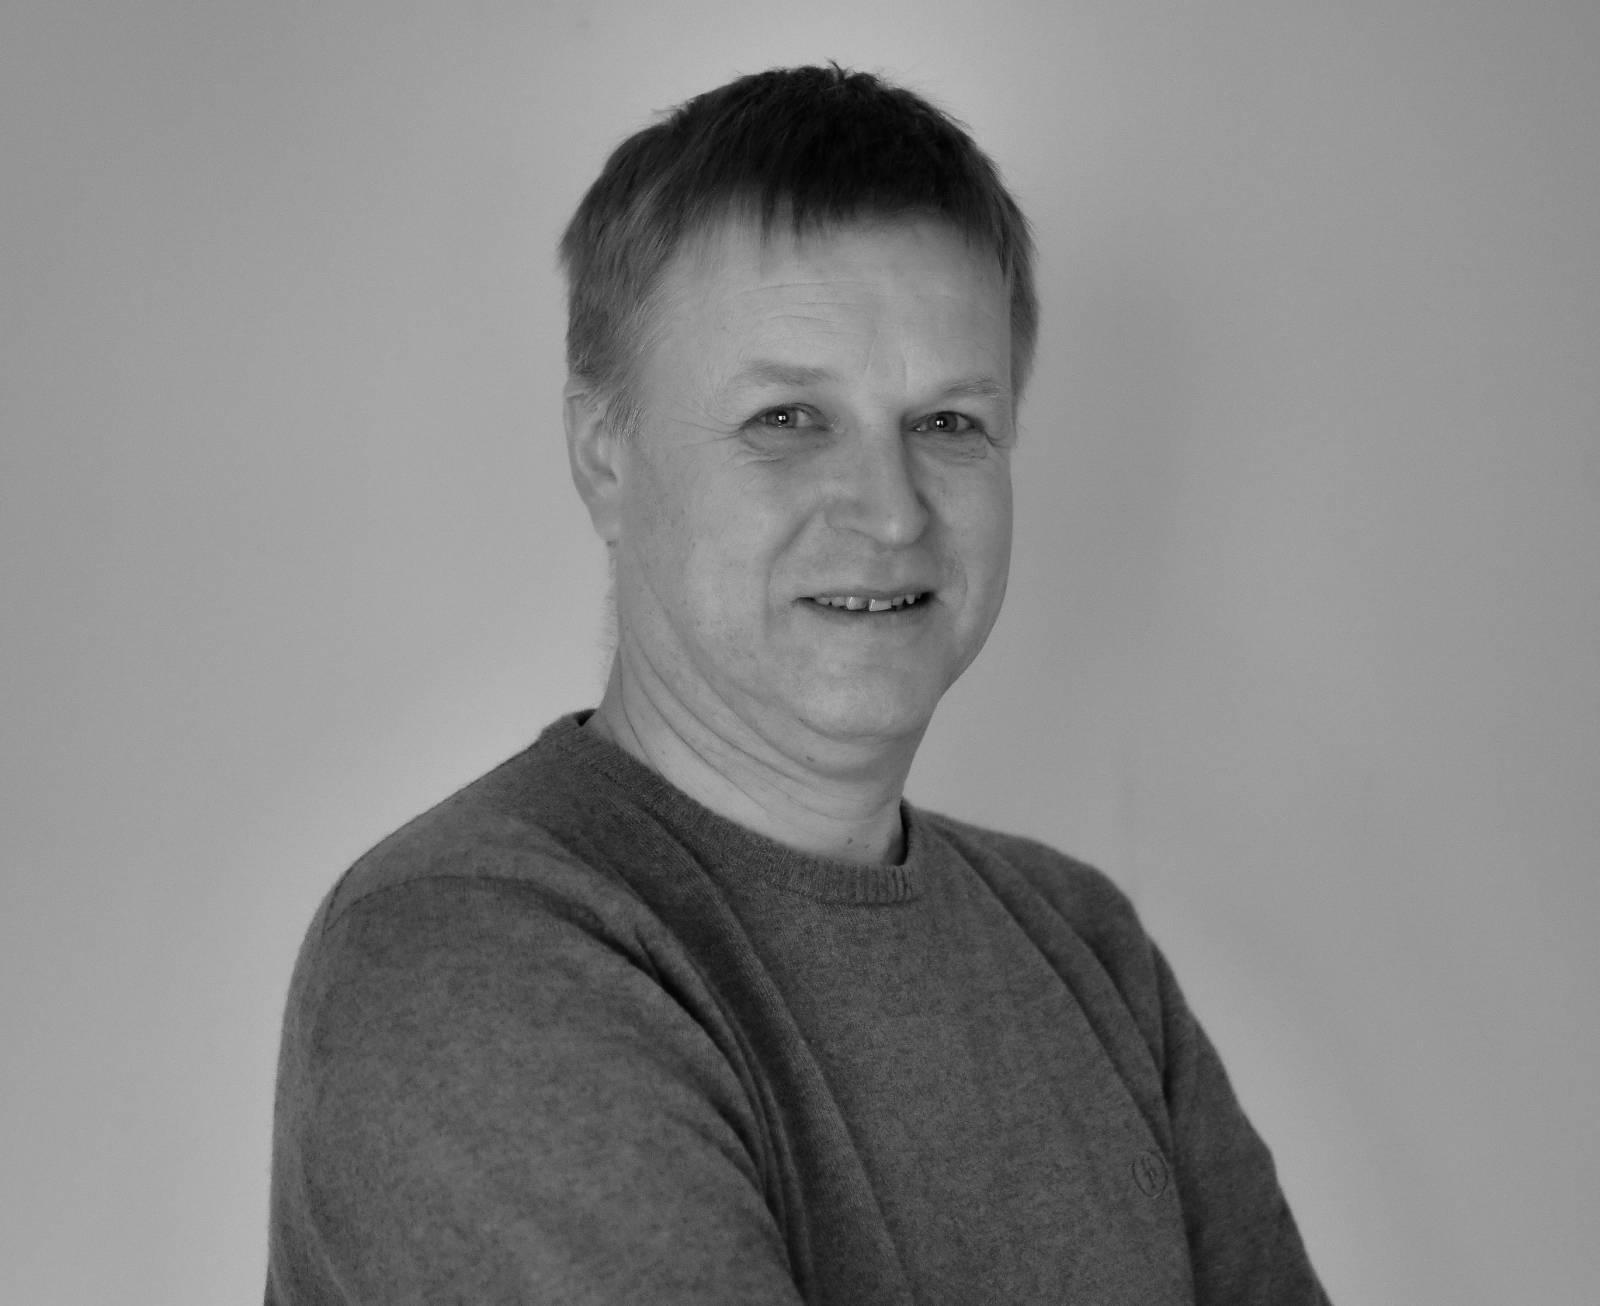 Levard Olsen-Hagen Jurist ved tariffavdelingen i SAFE